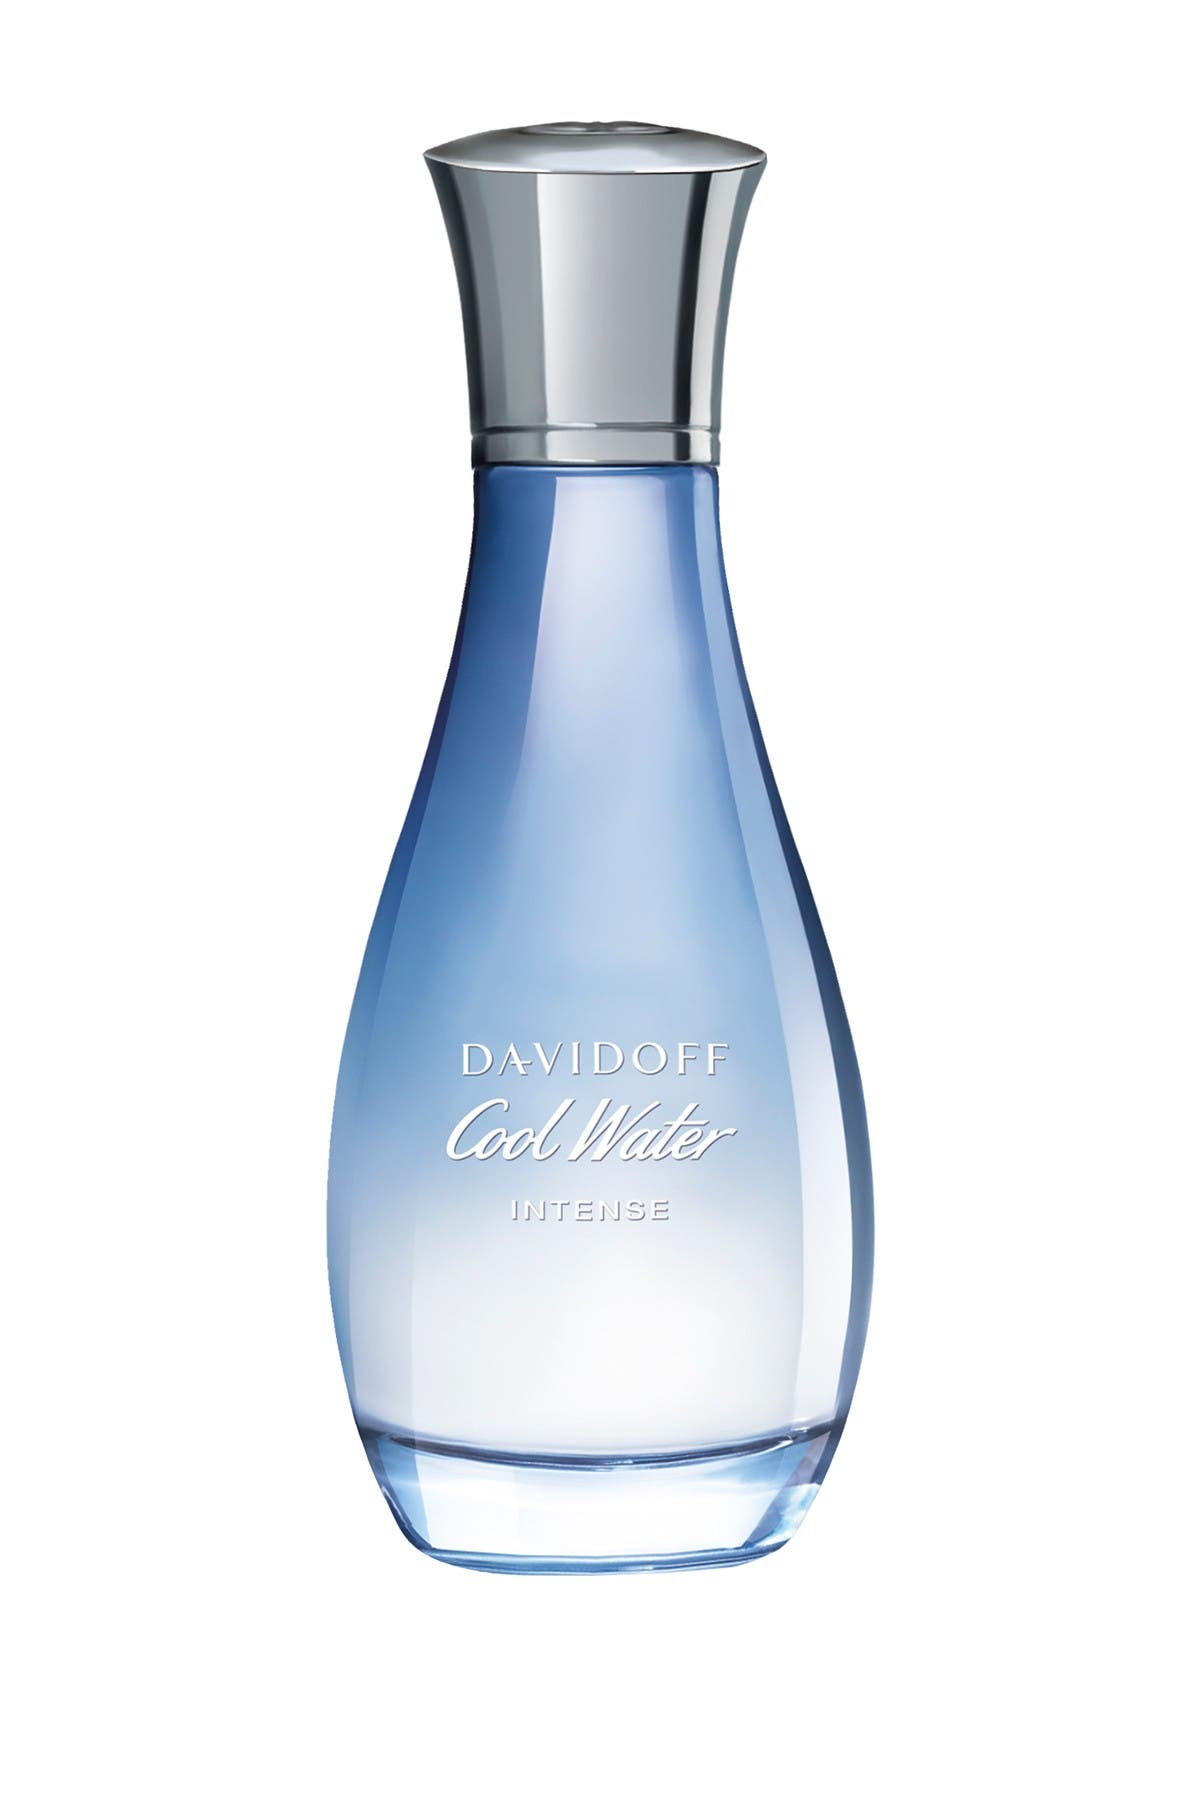 Image of Davidoff Cool Water Intense for Women Eau de Parfum Spray - 1.7 oz.